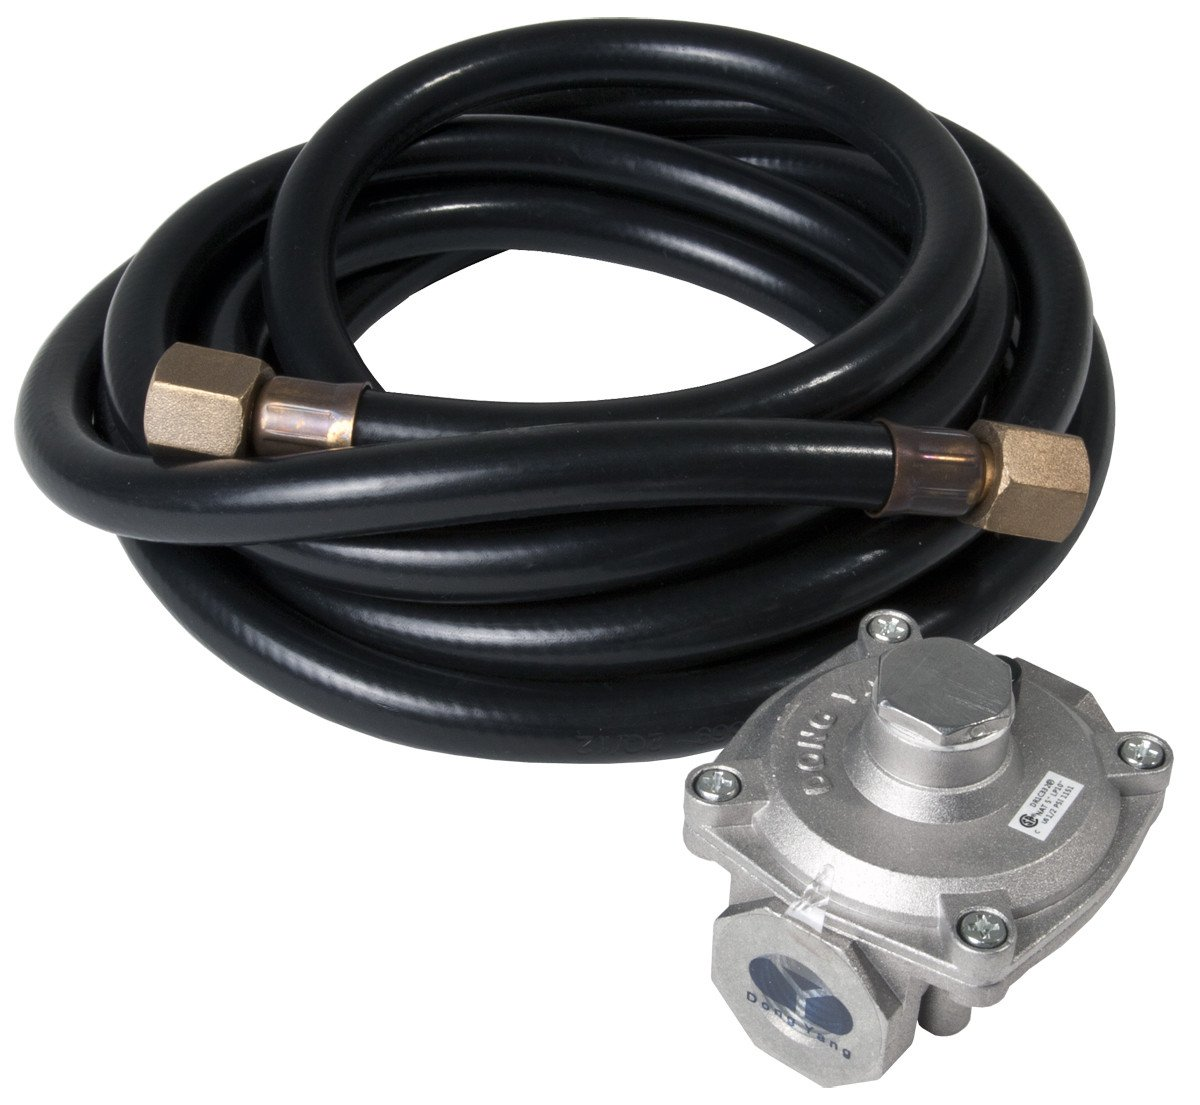 Regulator Hose for Autopilot NG CO2 Generator, 12'